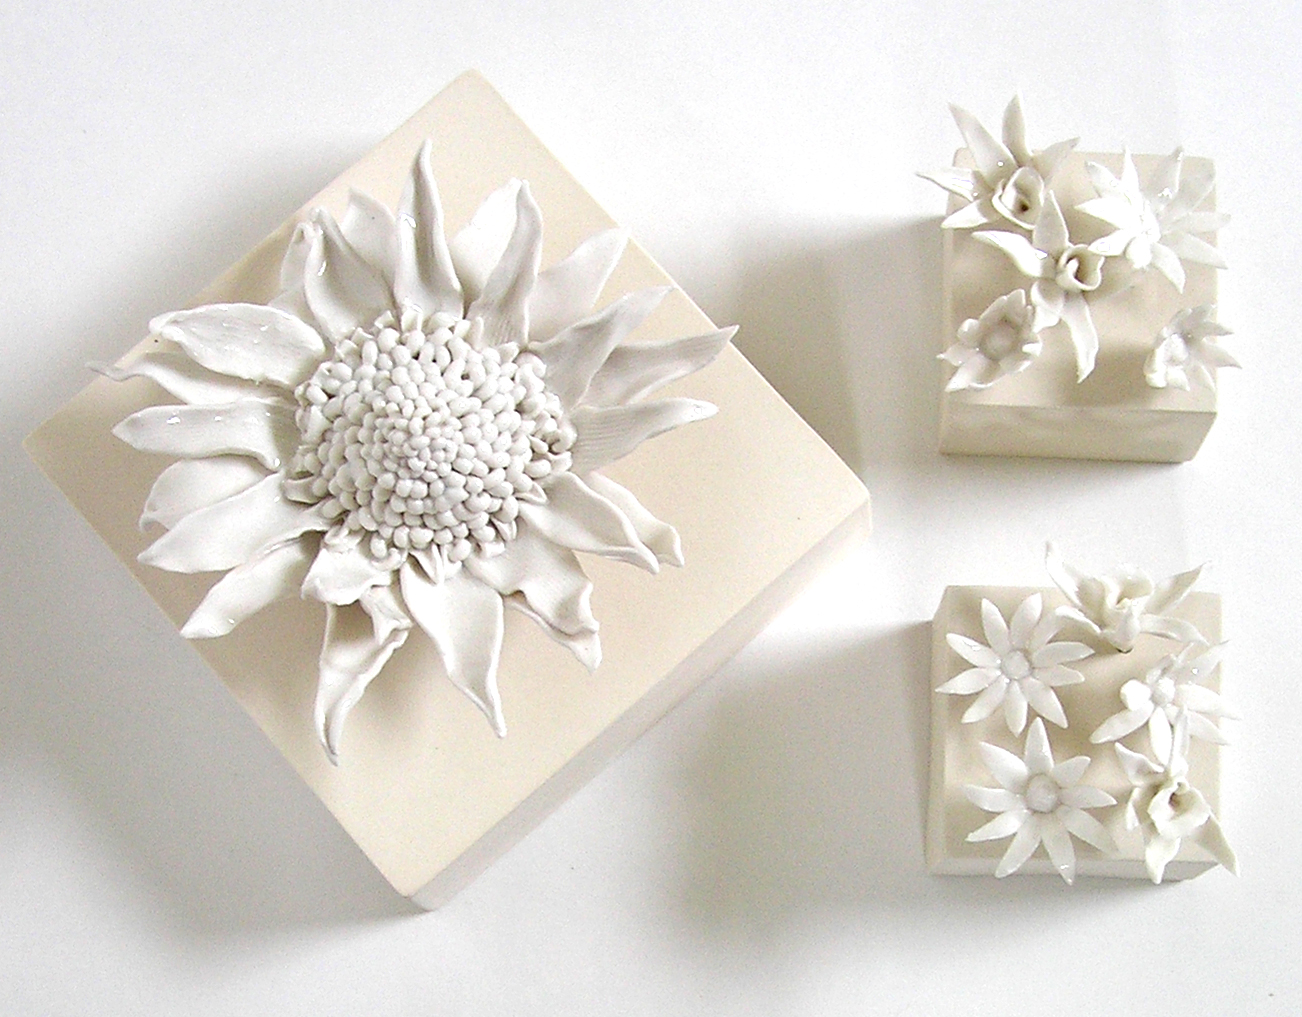 Frozen Assets: porcelain hand built